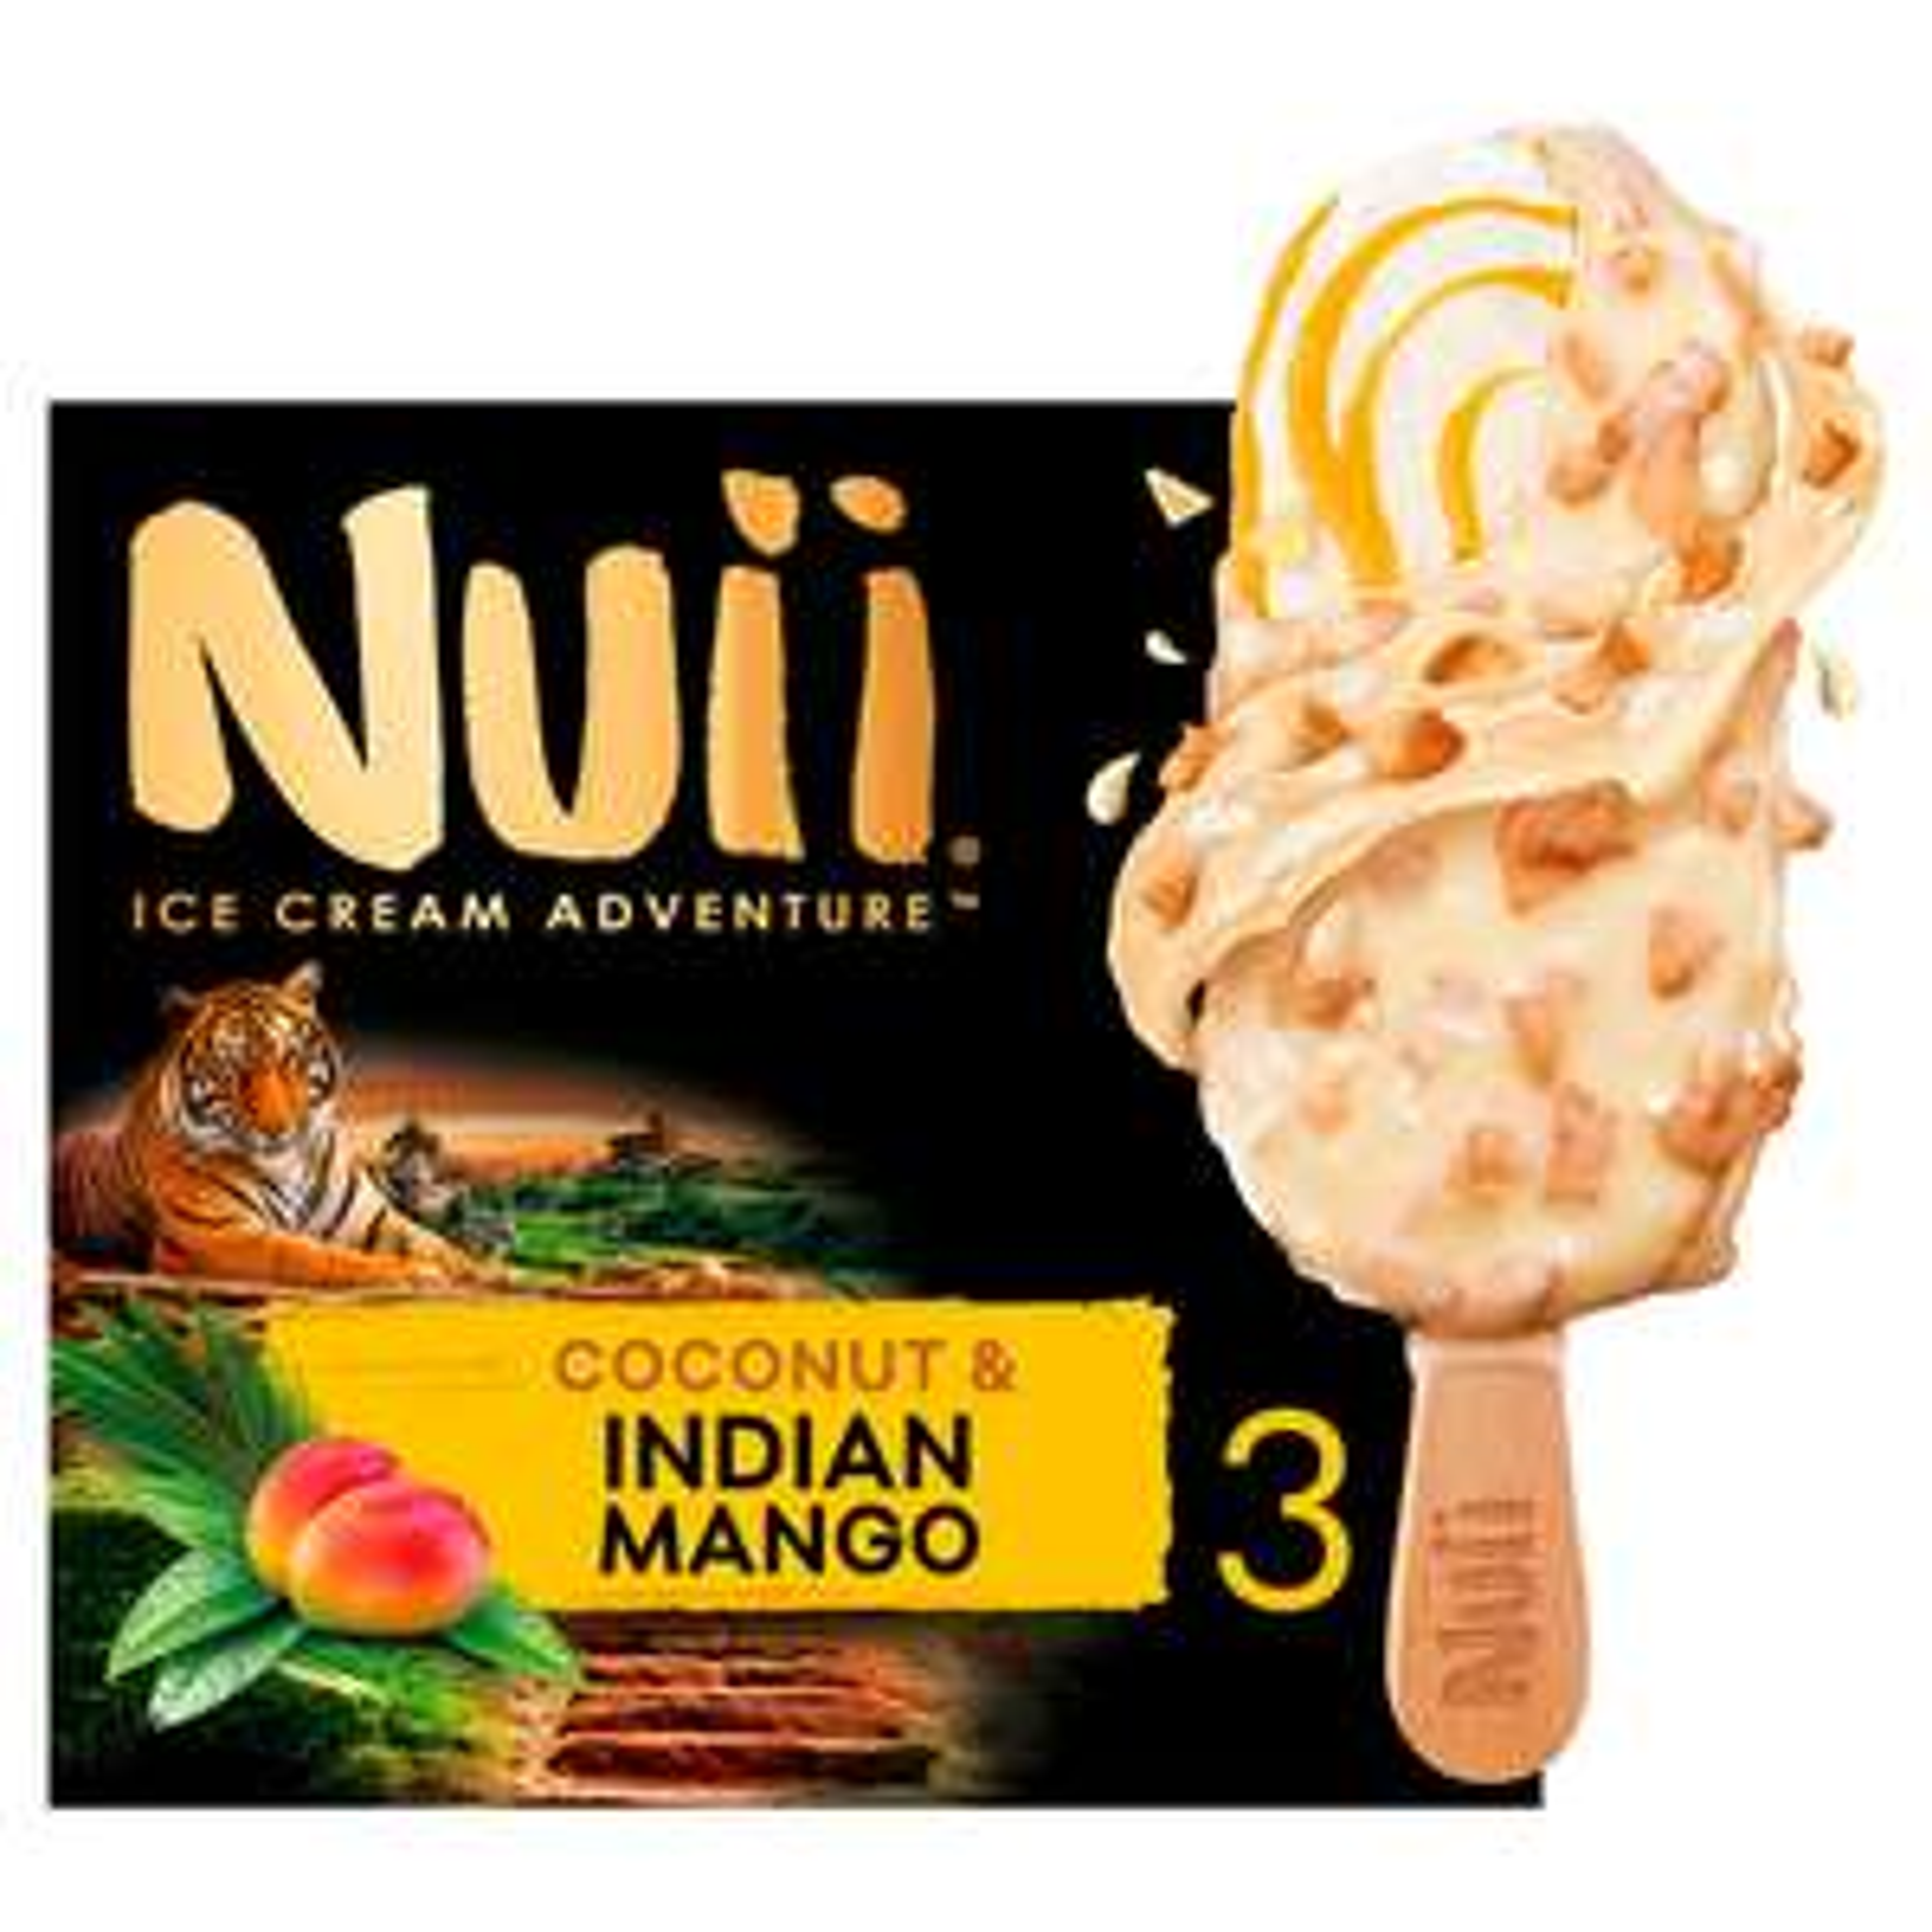 Nuii Ice Cream Aventure Coconut & Indian Mango 3x90ml £2 (Minimum Basket / Delivery Fee Applies) @ Sainsbury's